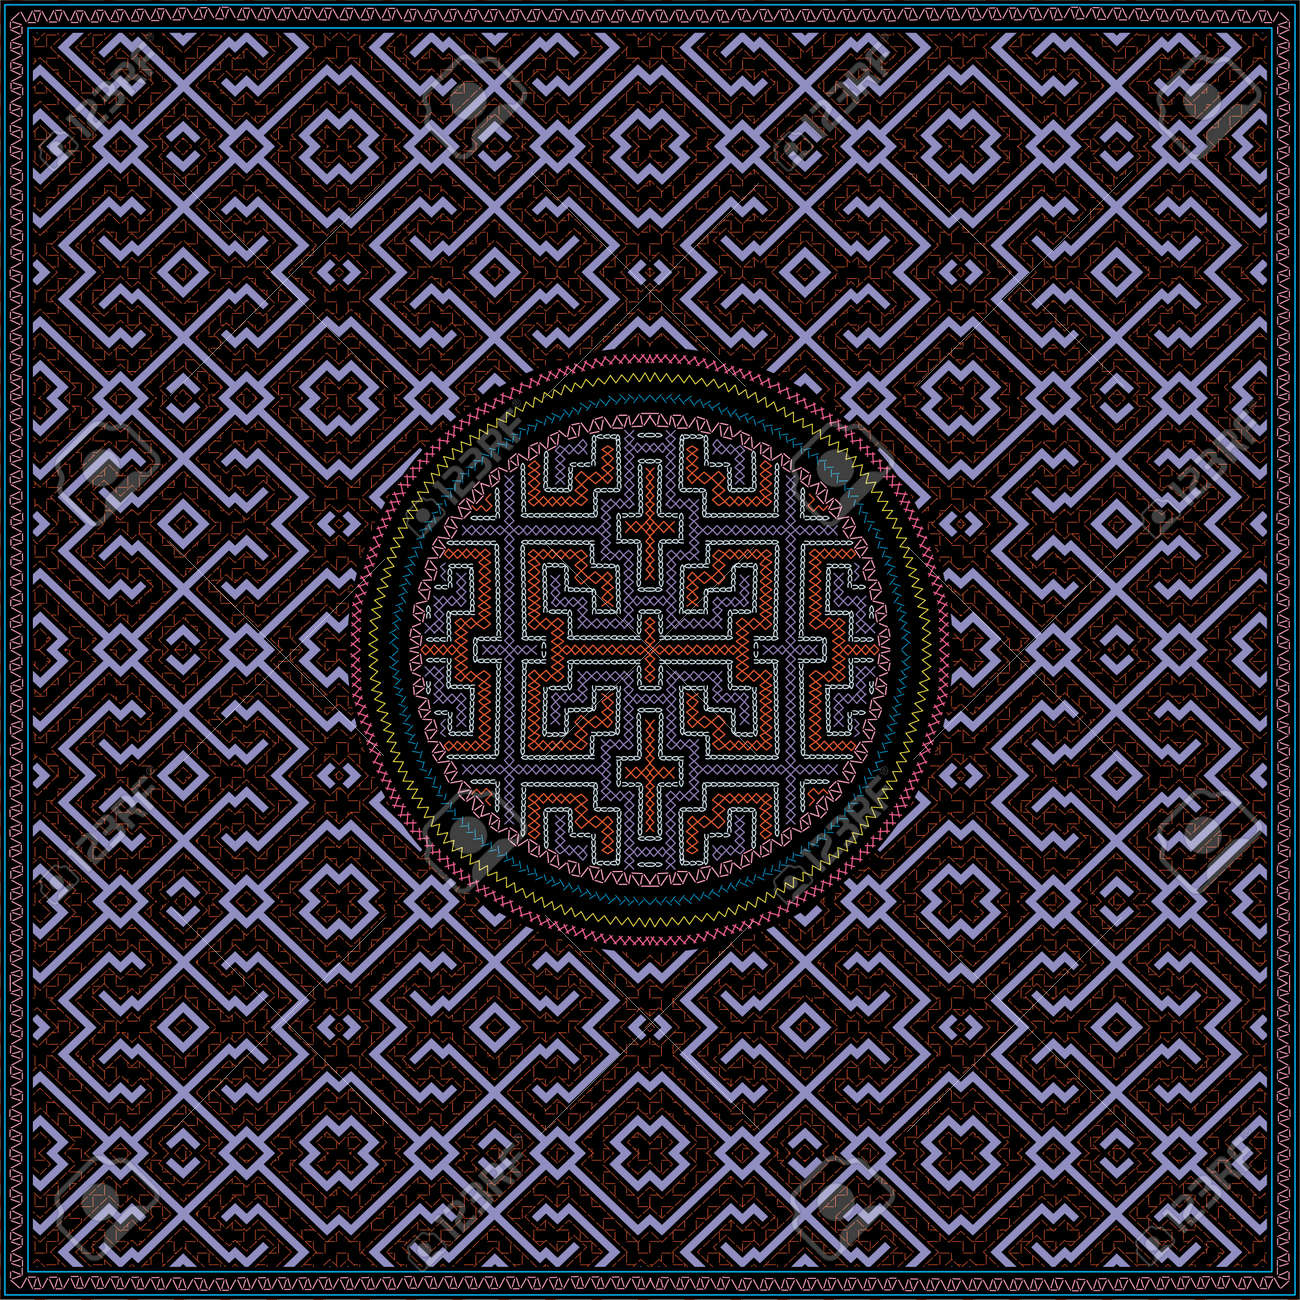 11 of 12 Shipibo Conibo artwork patterns HD set - 160578804